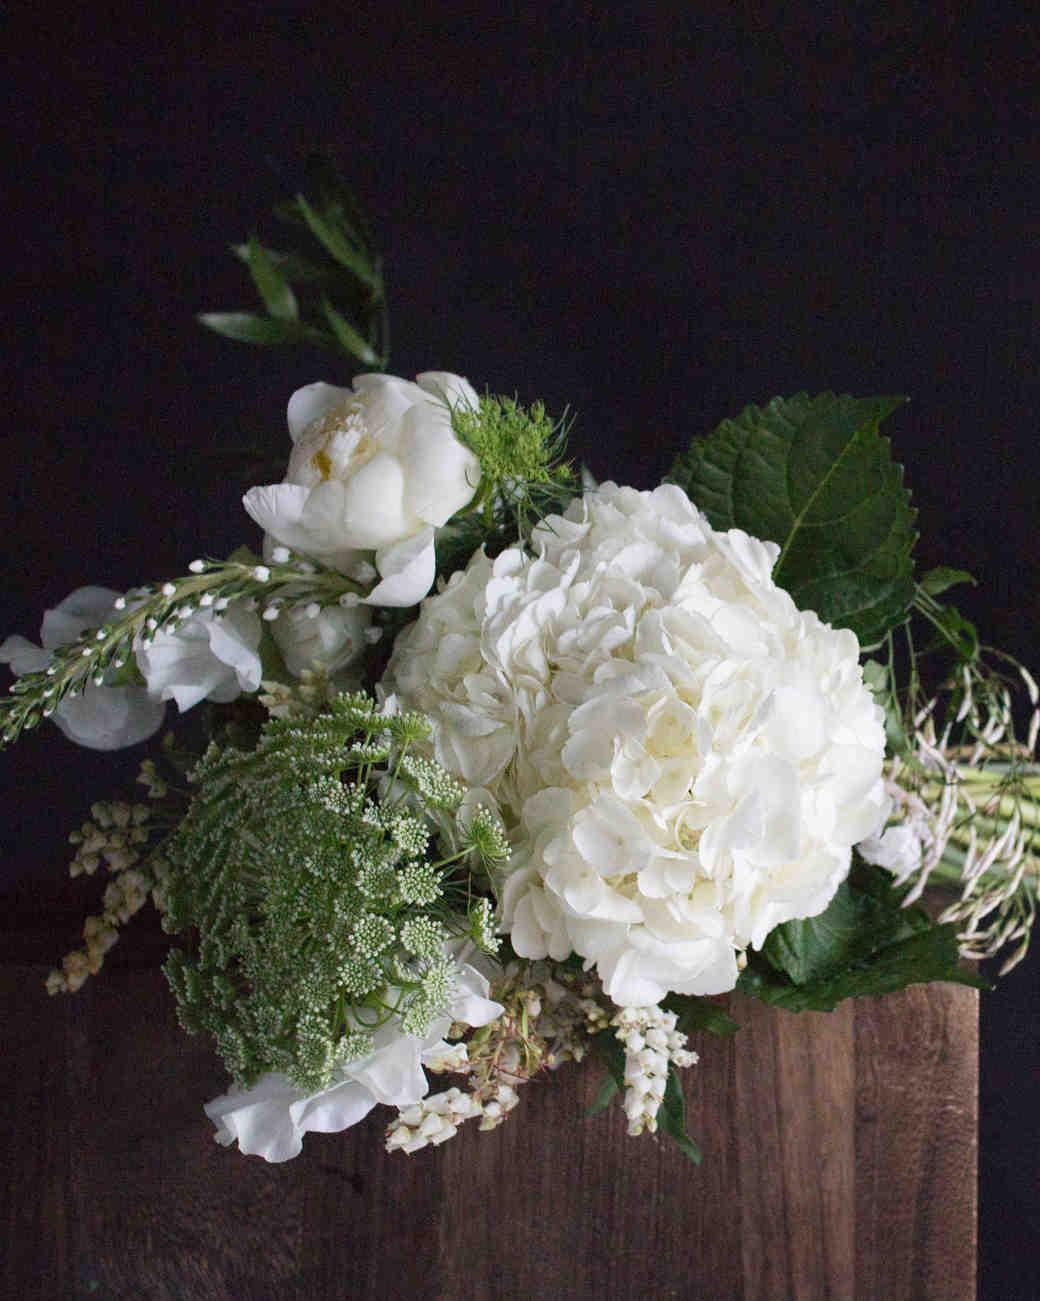 spring-floral-trend-6-0315.jpg